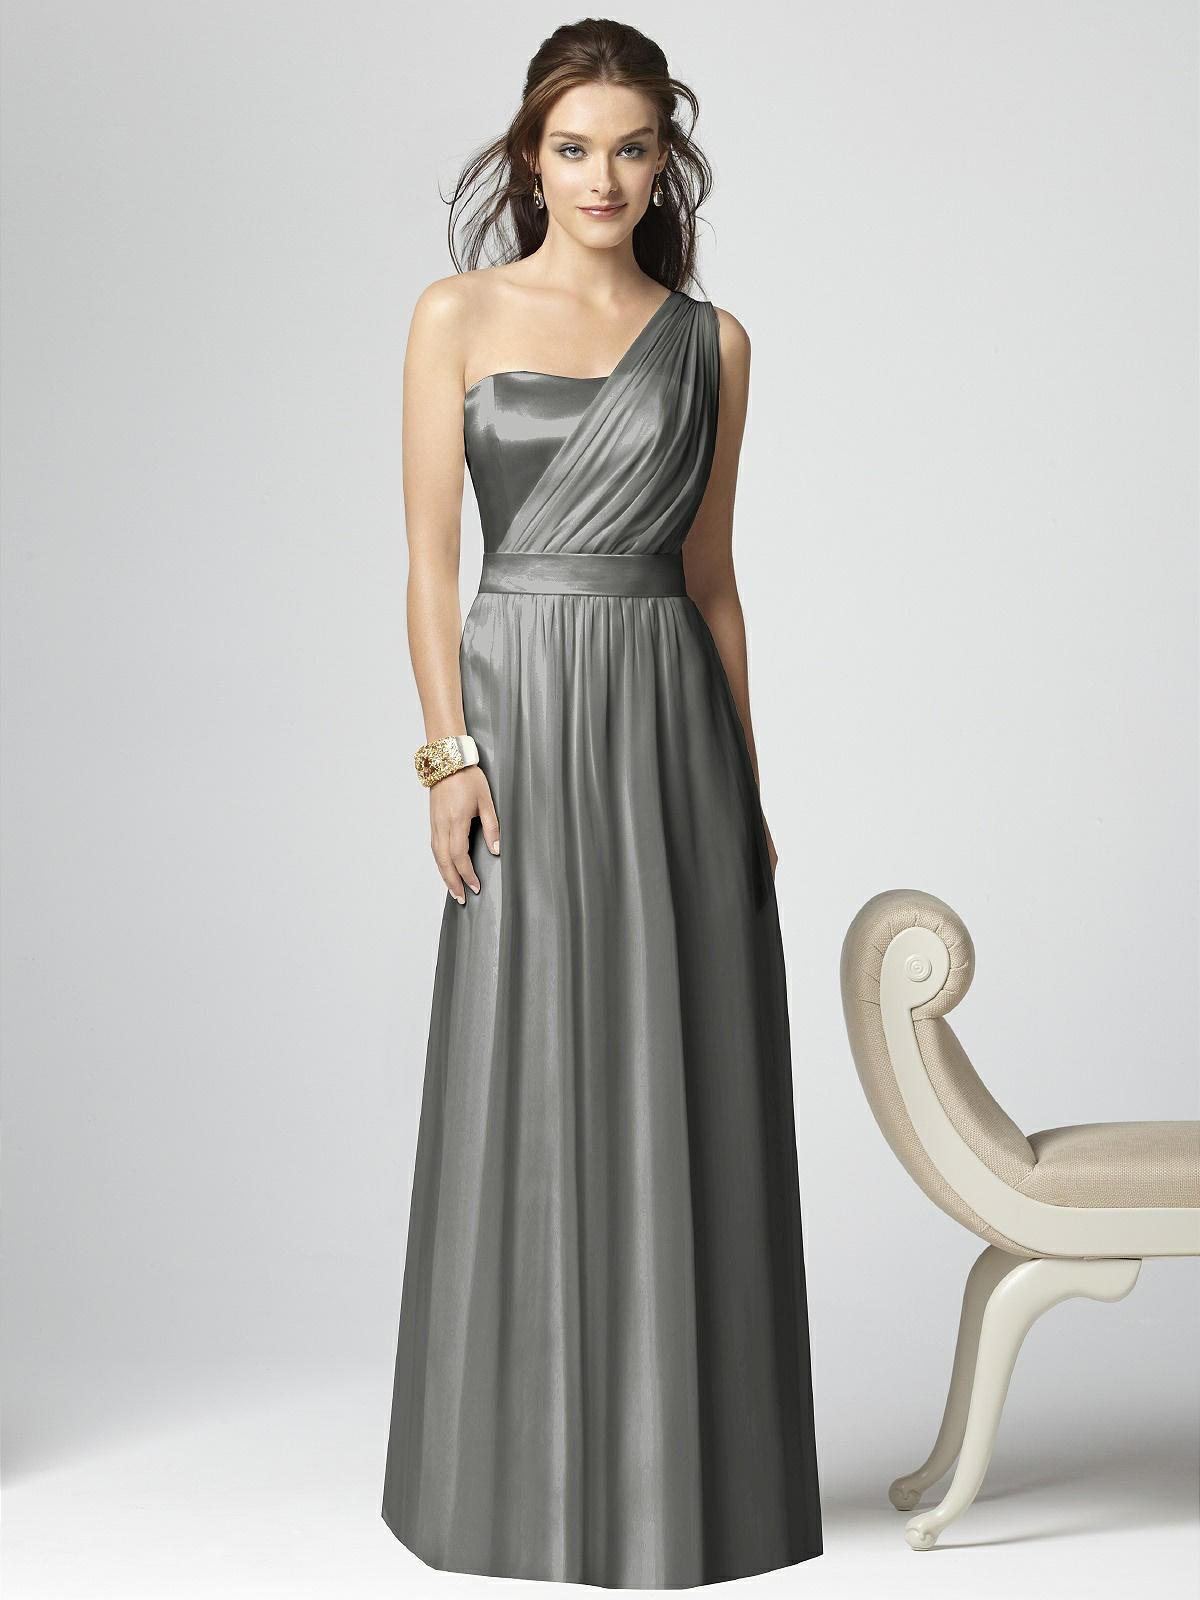 Cheap dessy bridesmaid dresses usa